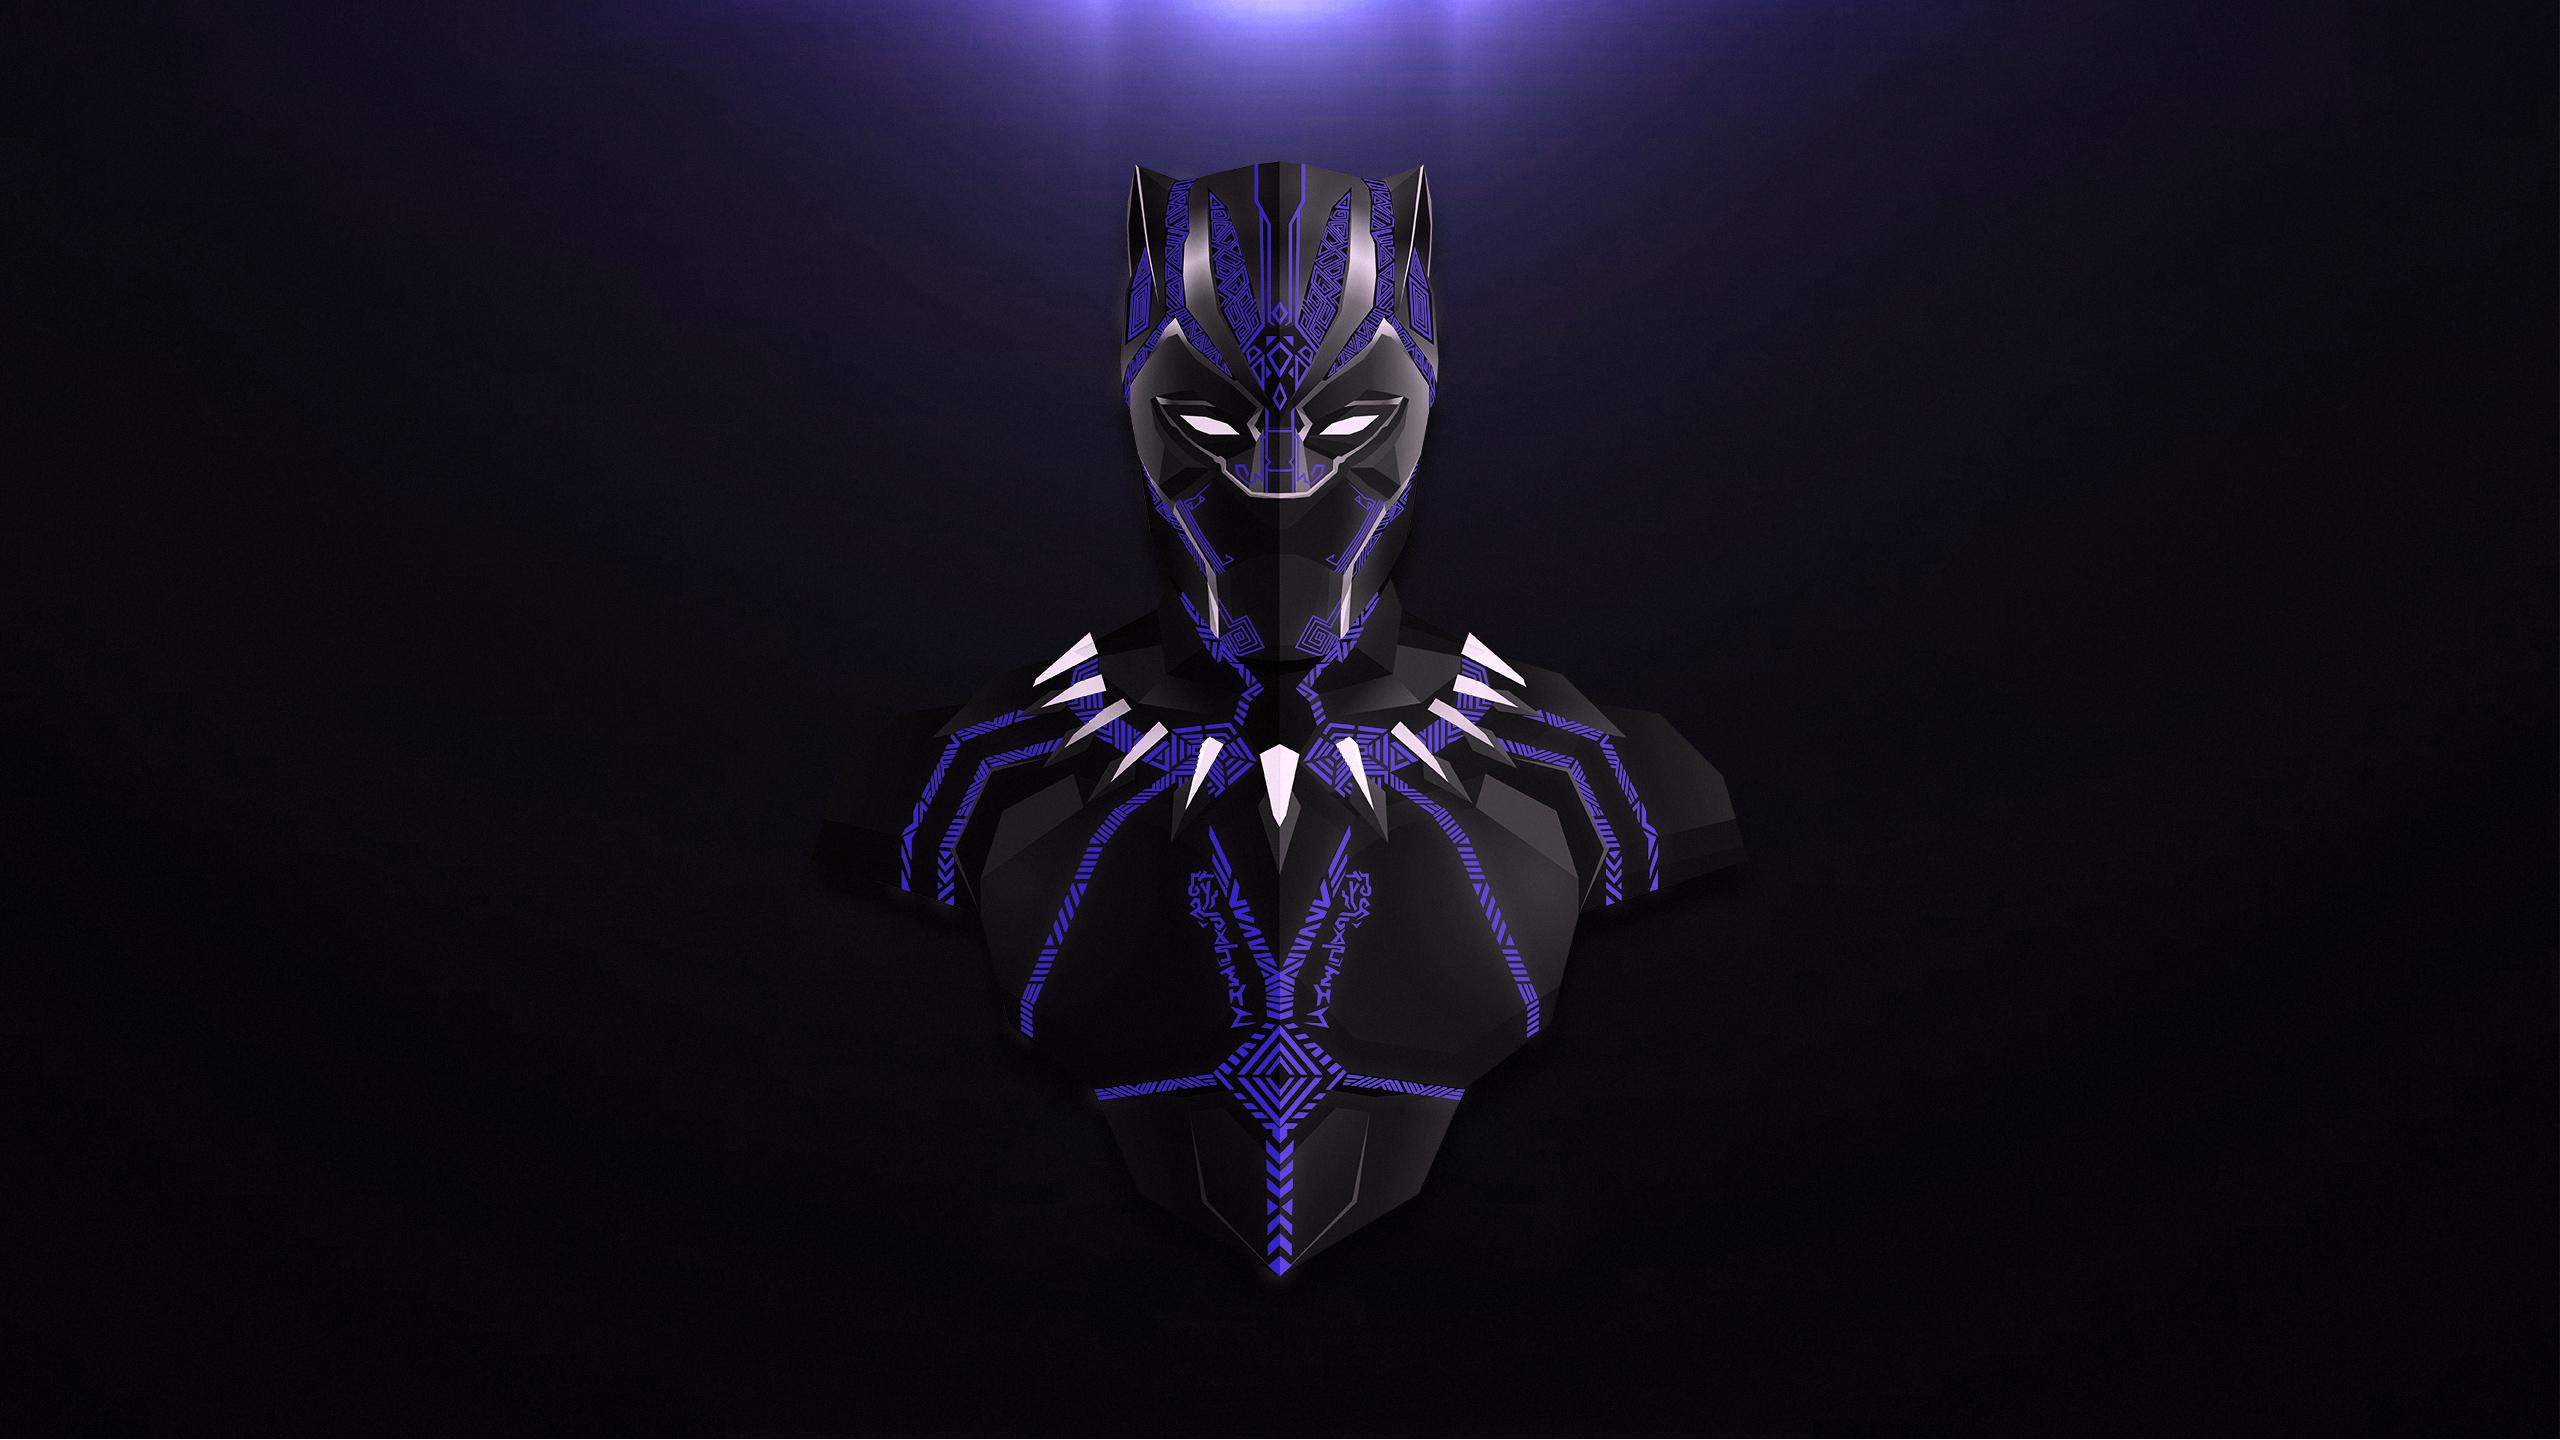 1080x1920 Daredevil Minimalism Iphone 7 6s 6 Plus Pixel: 1080x1920 Black Panther Lowpoly Minimalism Iphone 7,6s,6